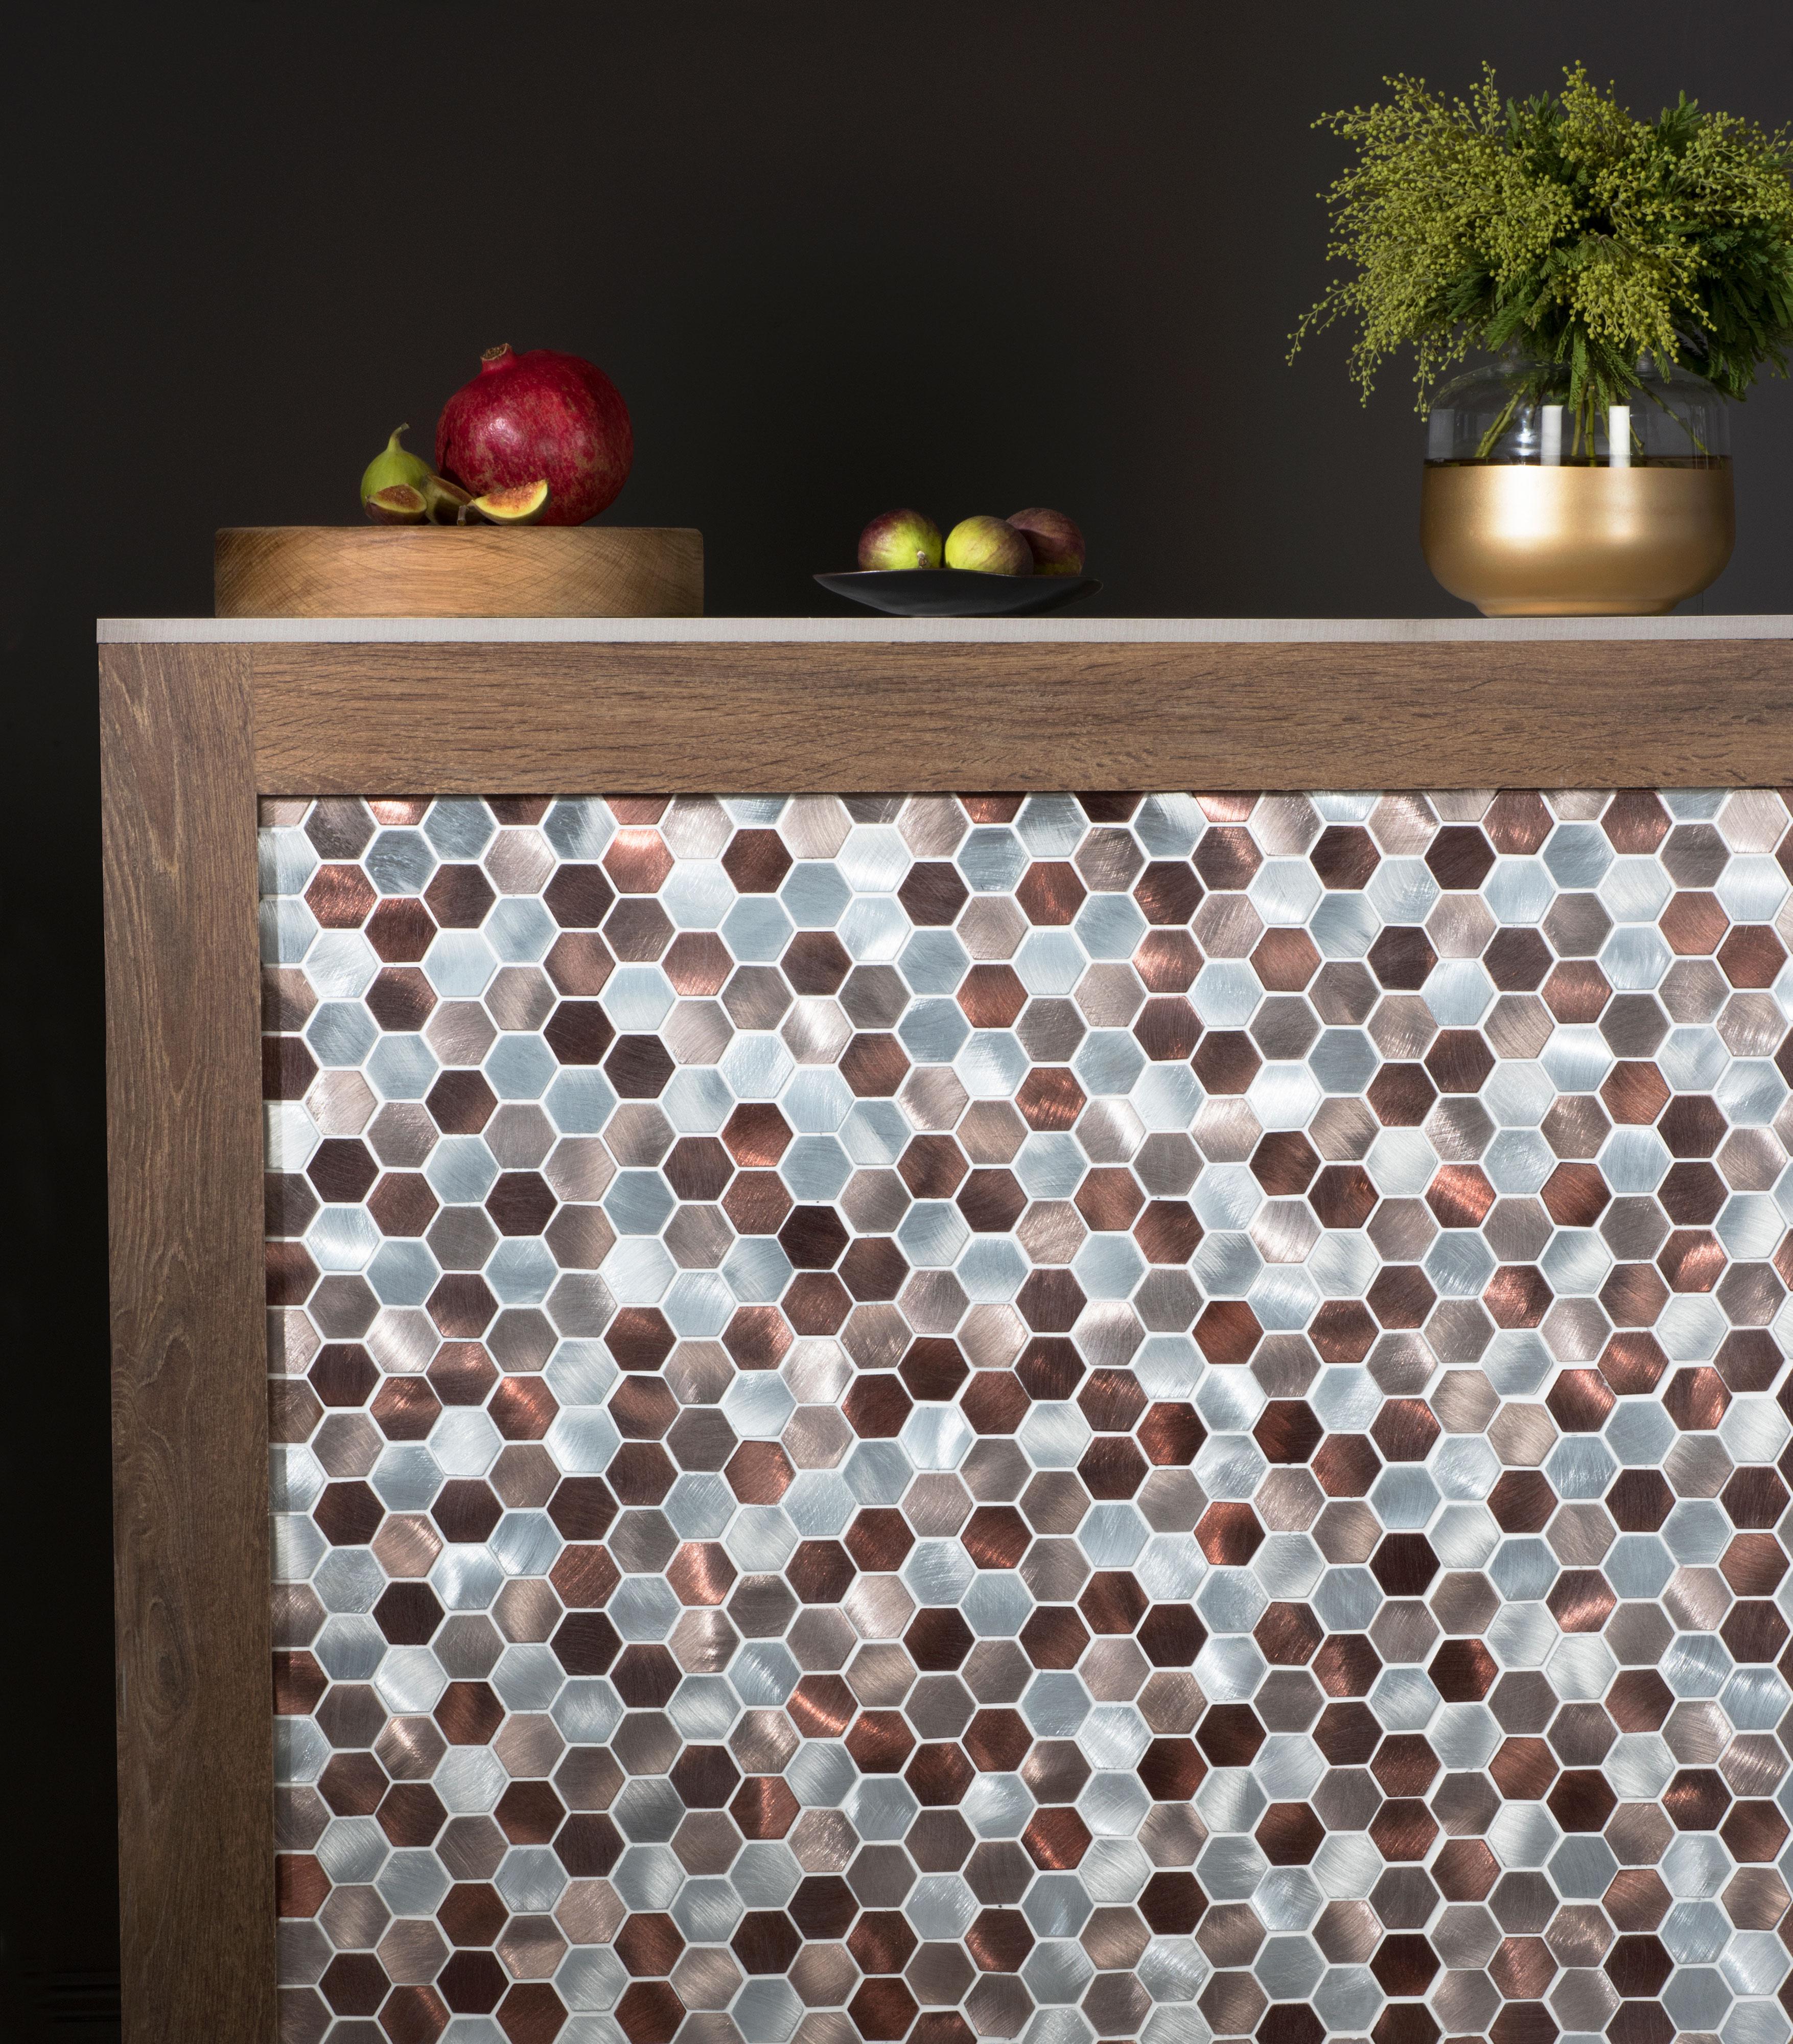 Original Style Mosaic Tiles Glass